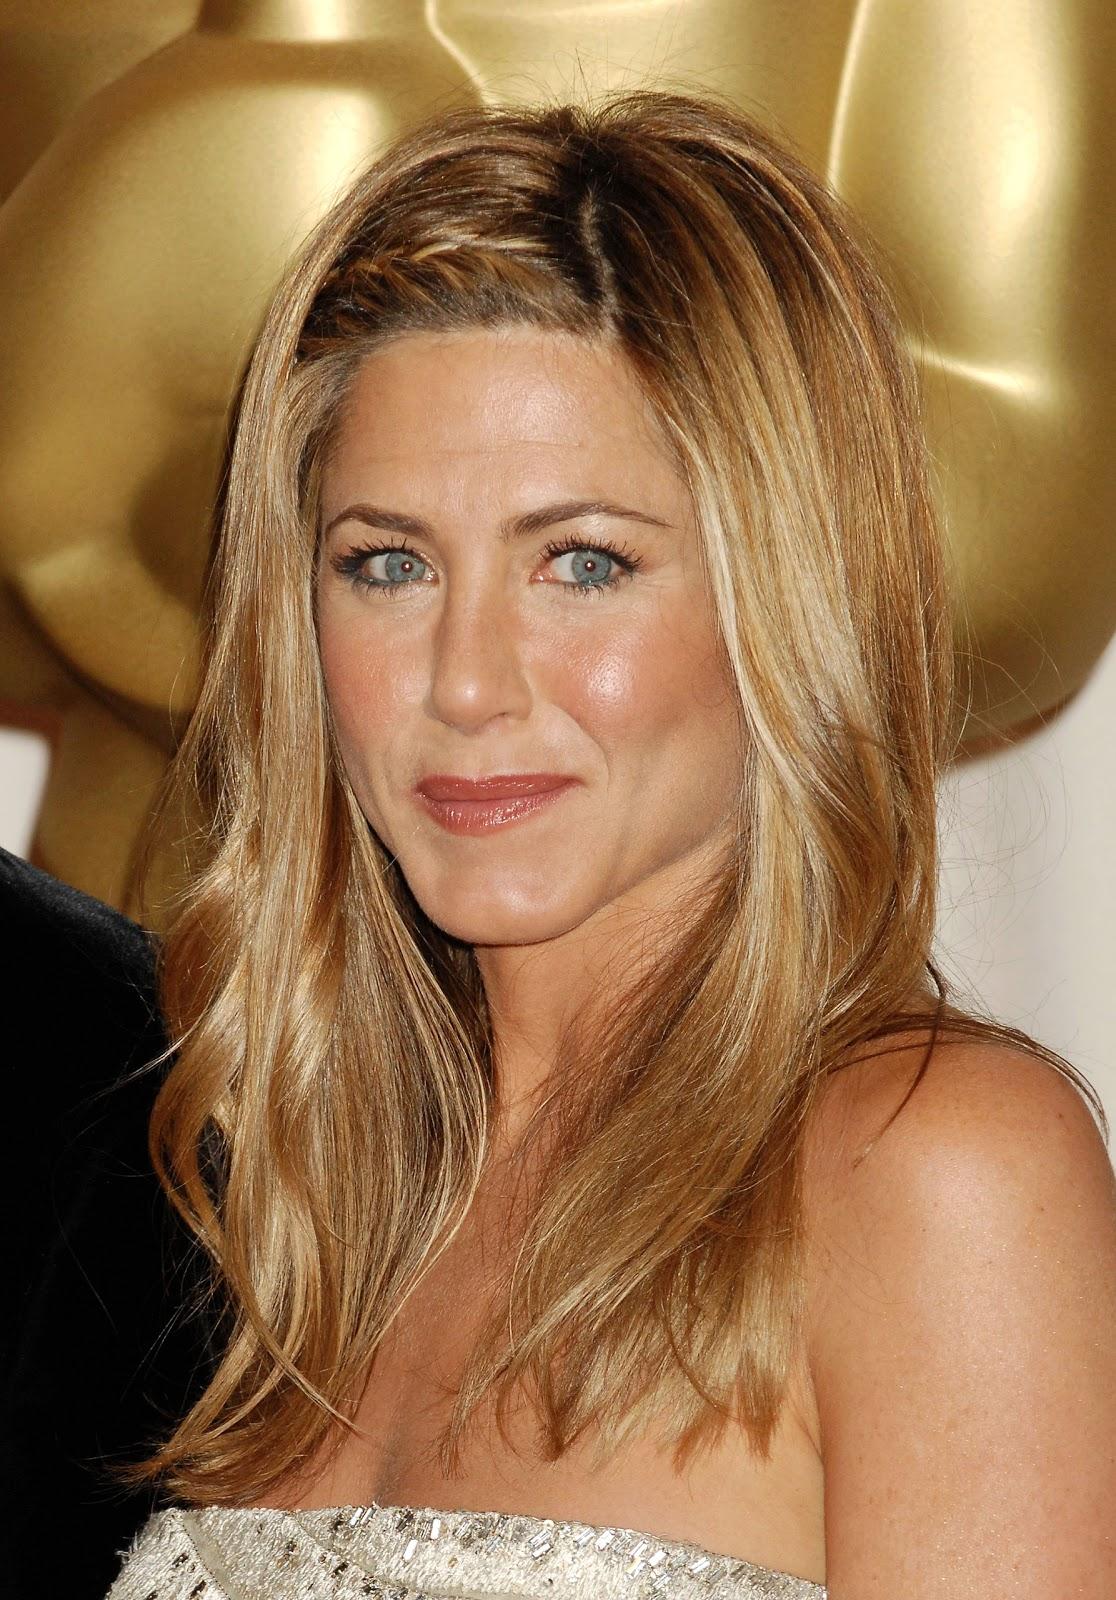 Free Nude Pics Of Jennifer Aniston